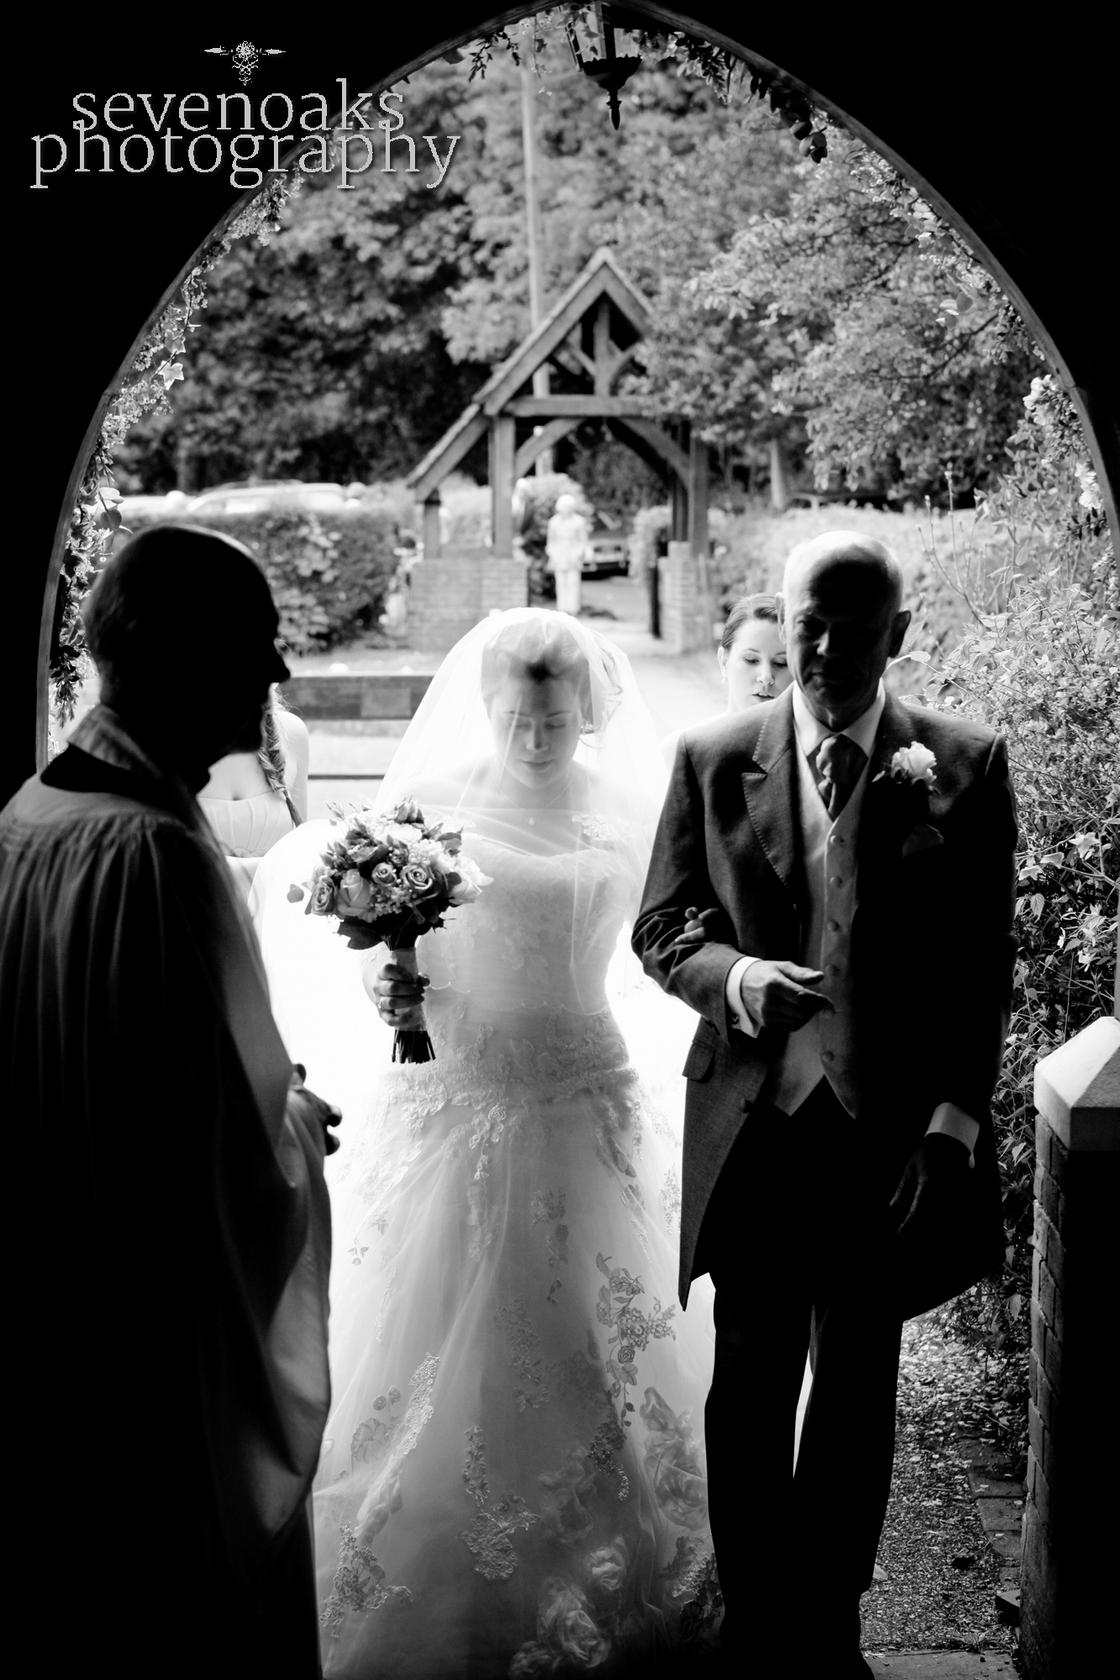 Sevenoaks documentary wedding photographer-81.jpg